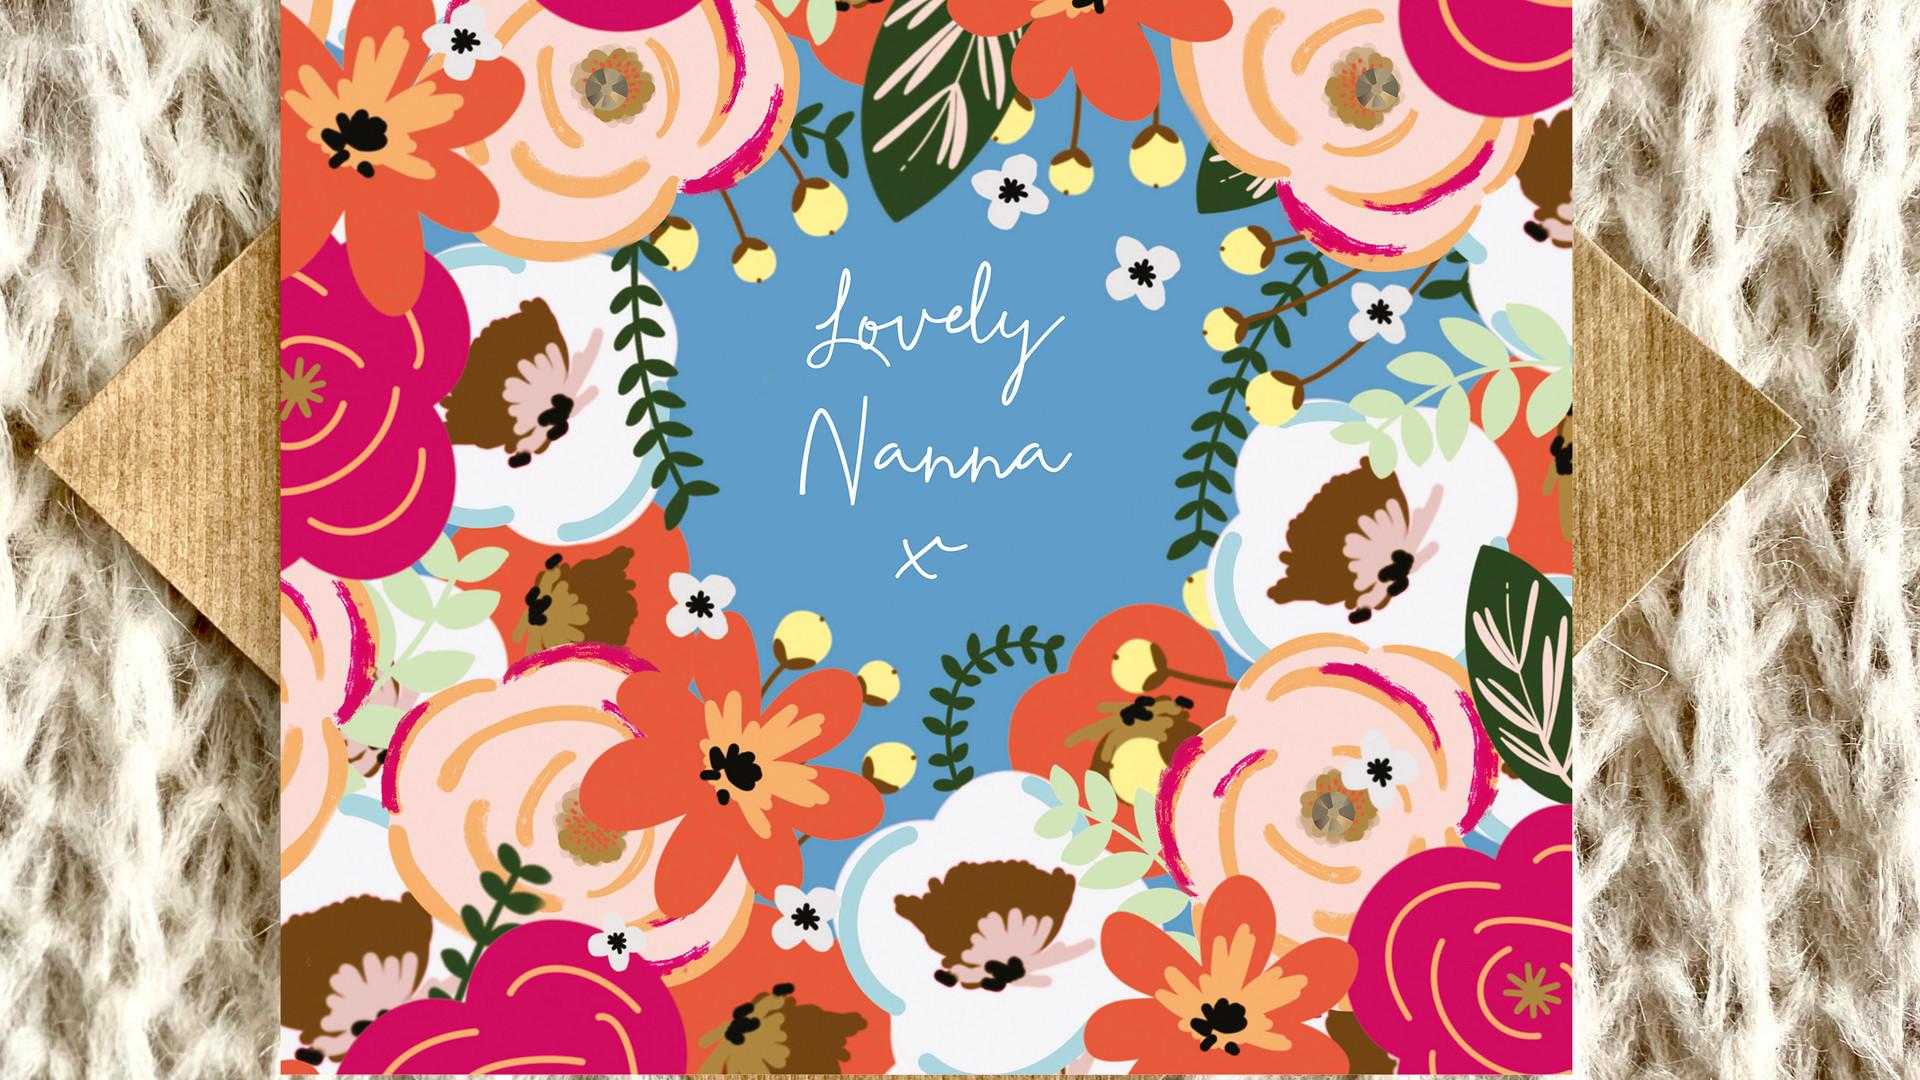 Lovely Nanna Birthday Card